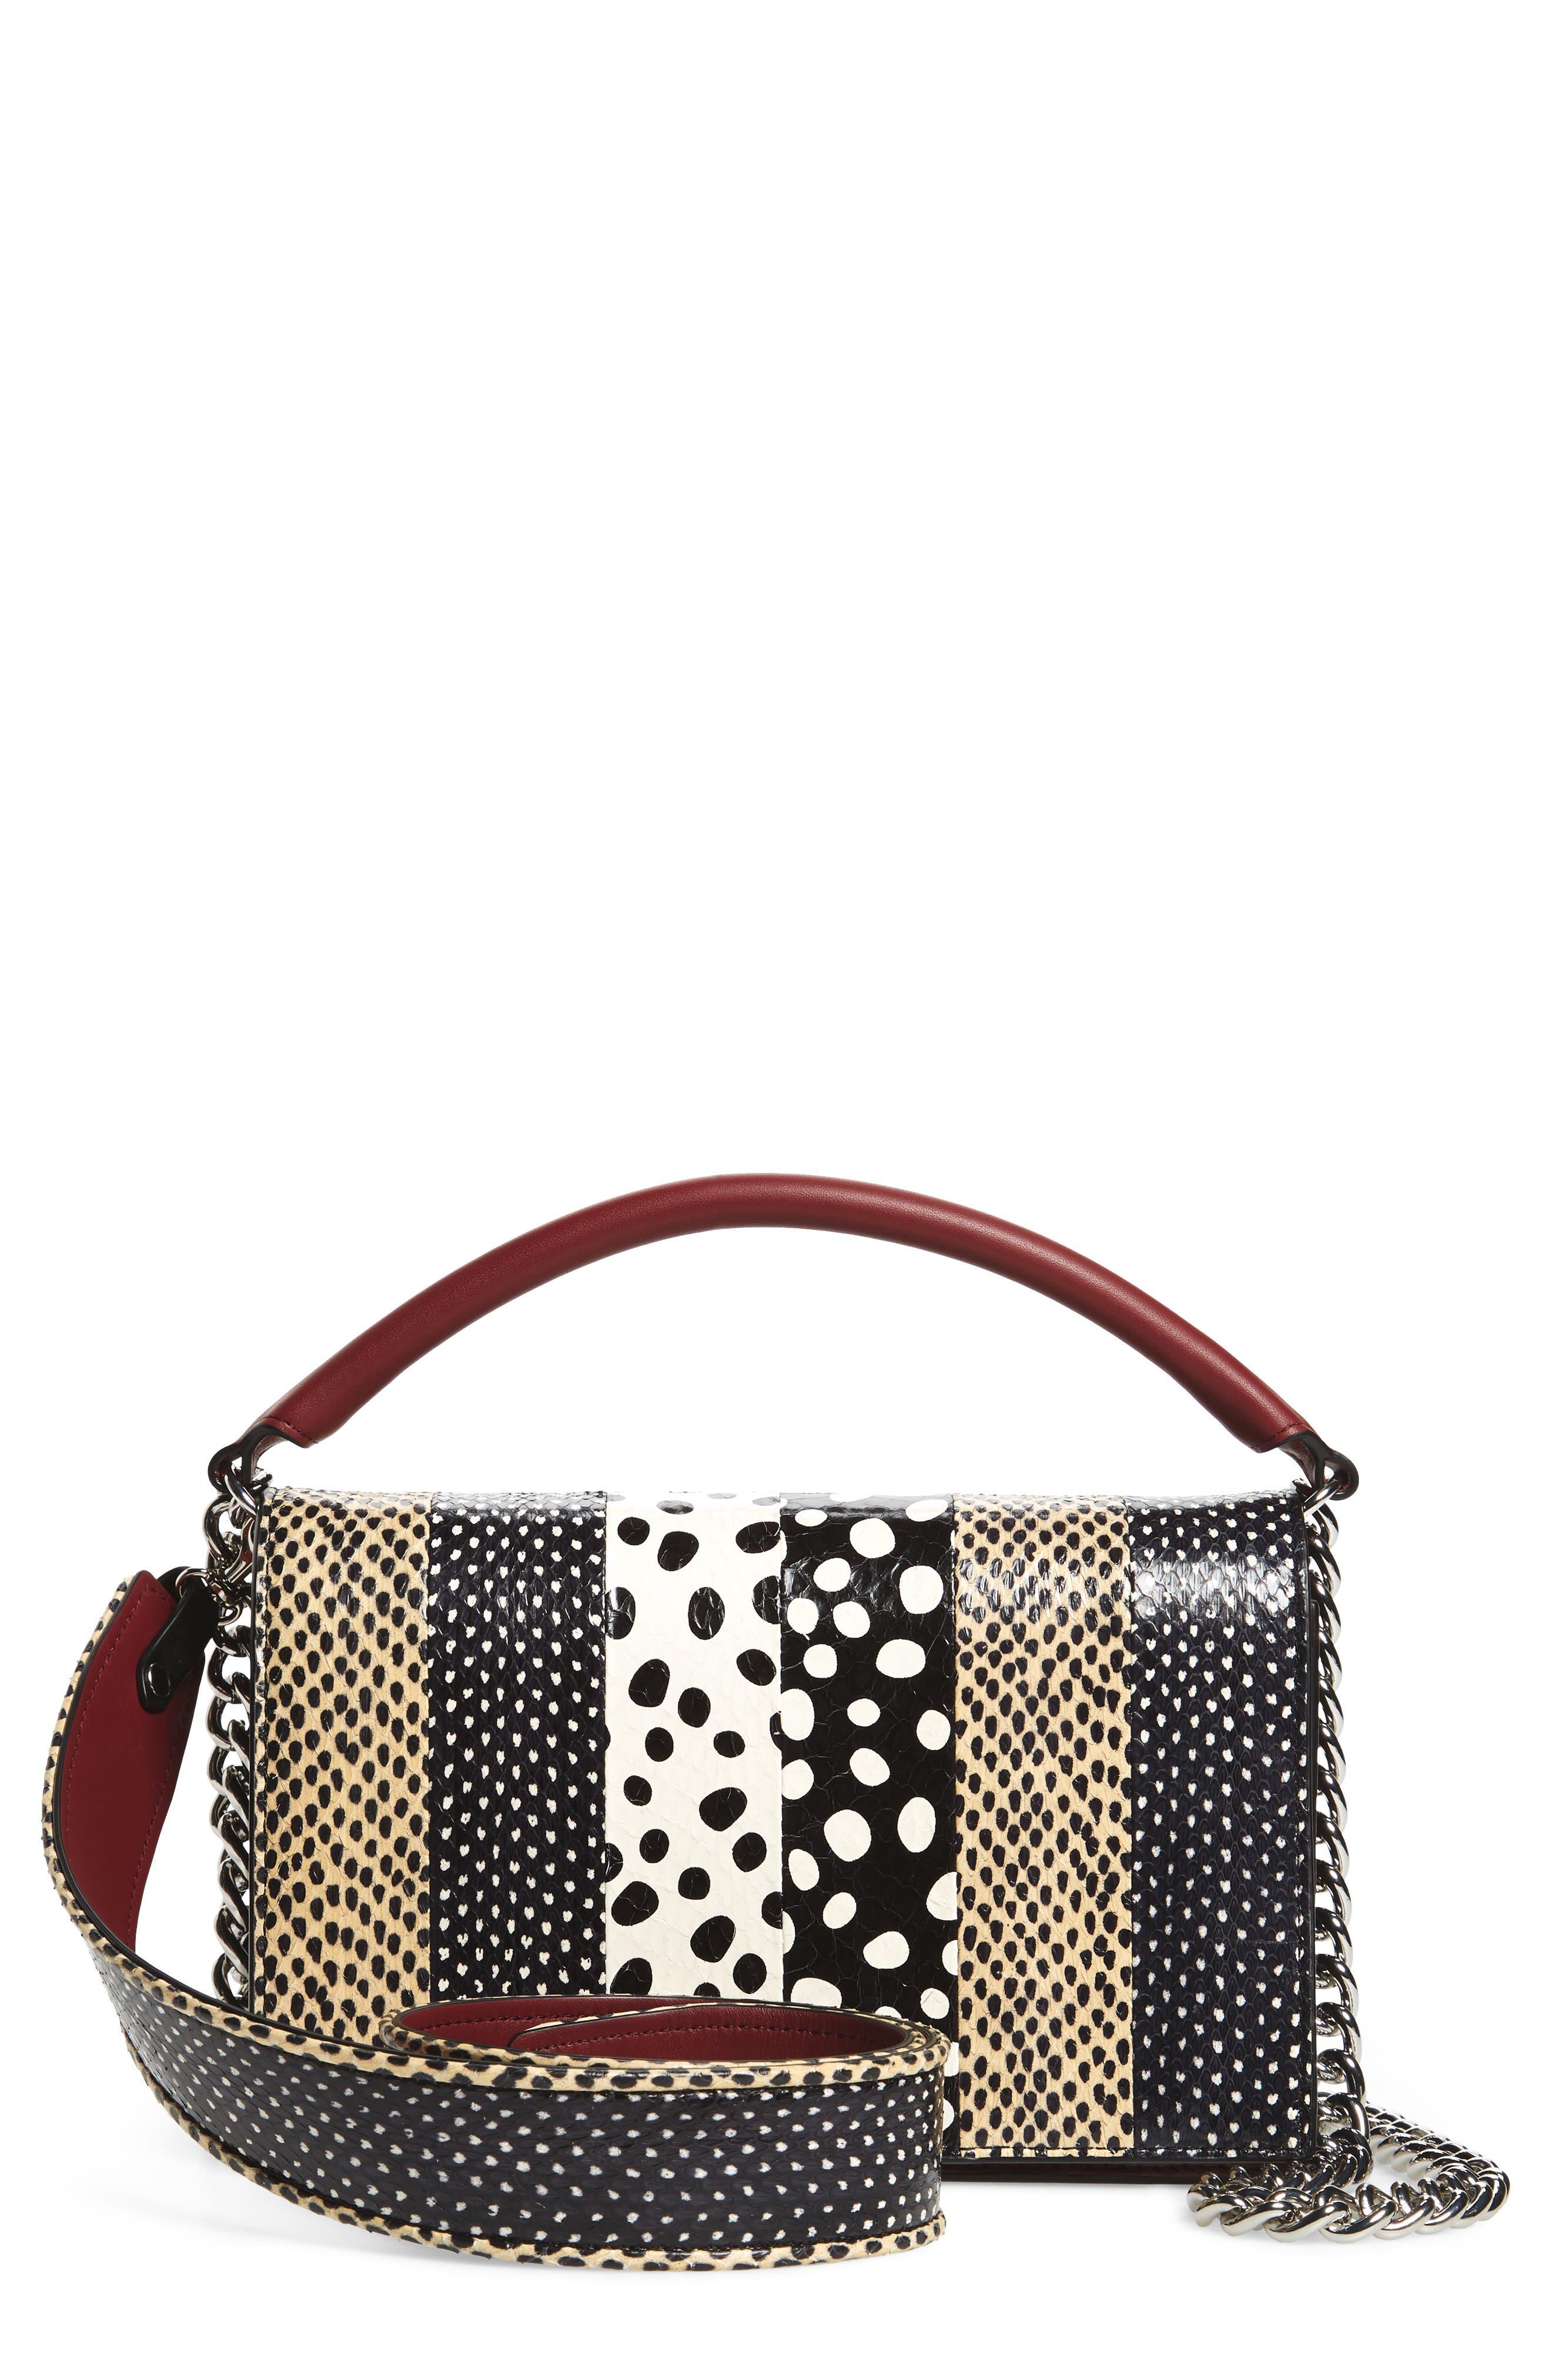 Diane von Furstenberg Bonne Soirée Leather & Genuine Snakeskin Top Handle Bag